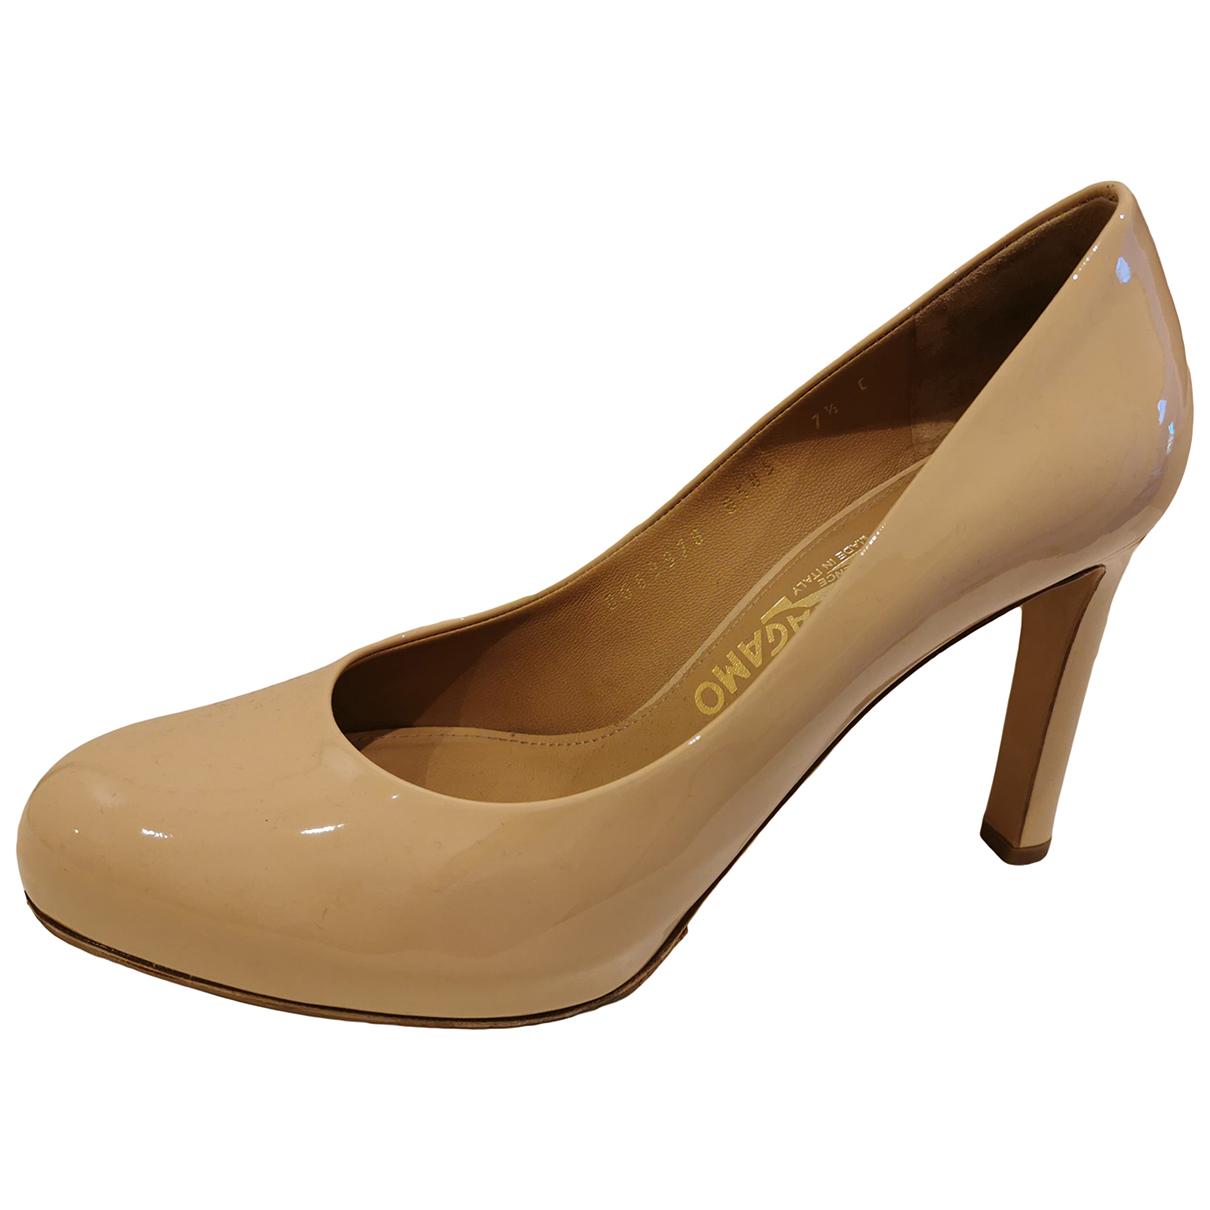 Salvatore Ferragamo N Beige Patent leather Heels for Women 37.5 EU